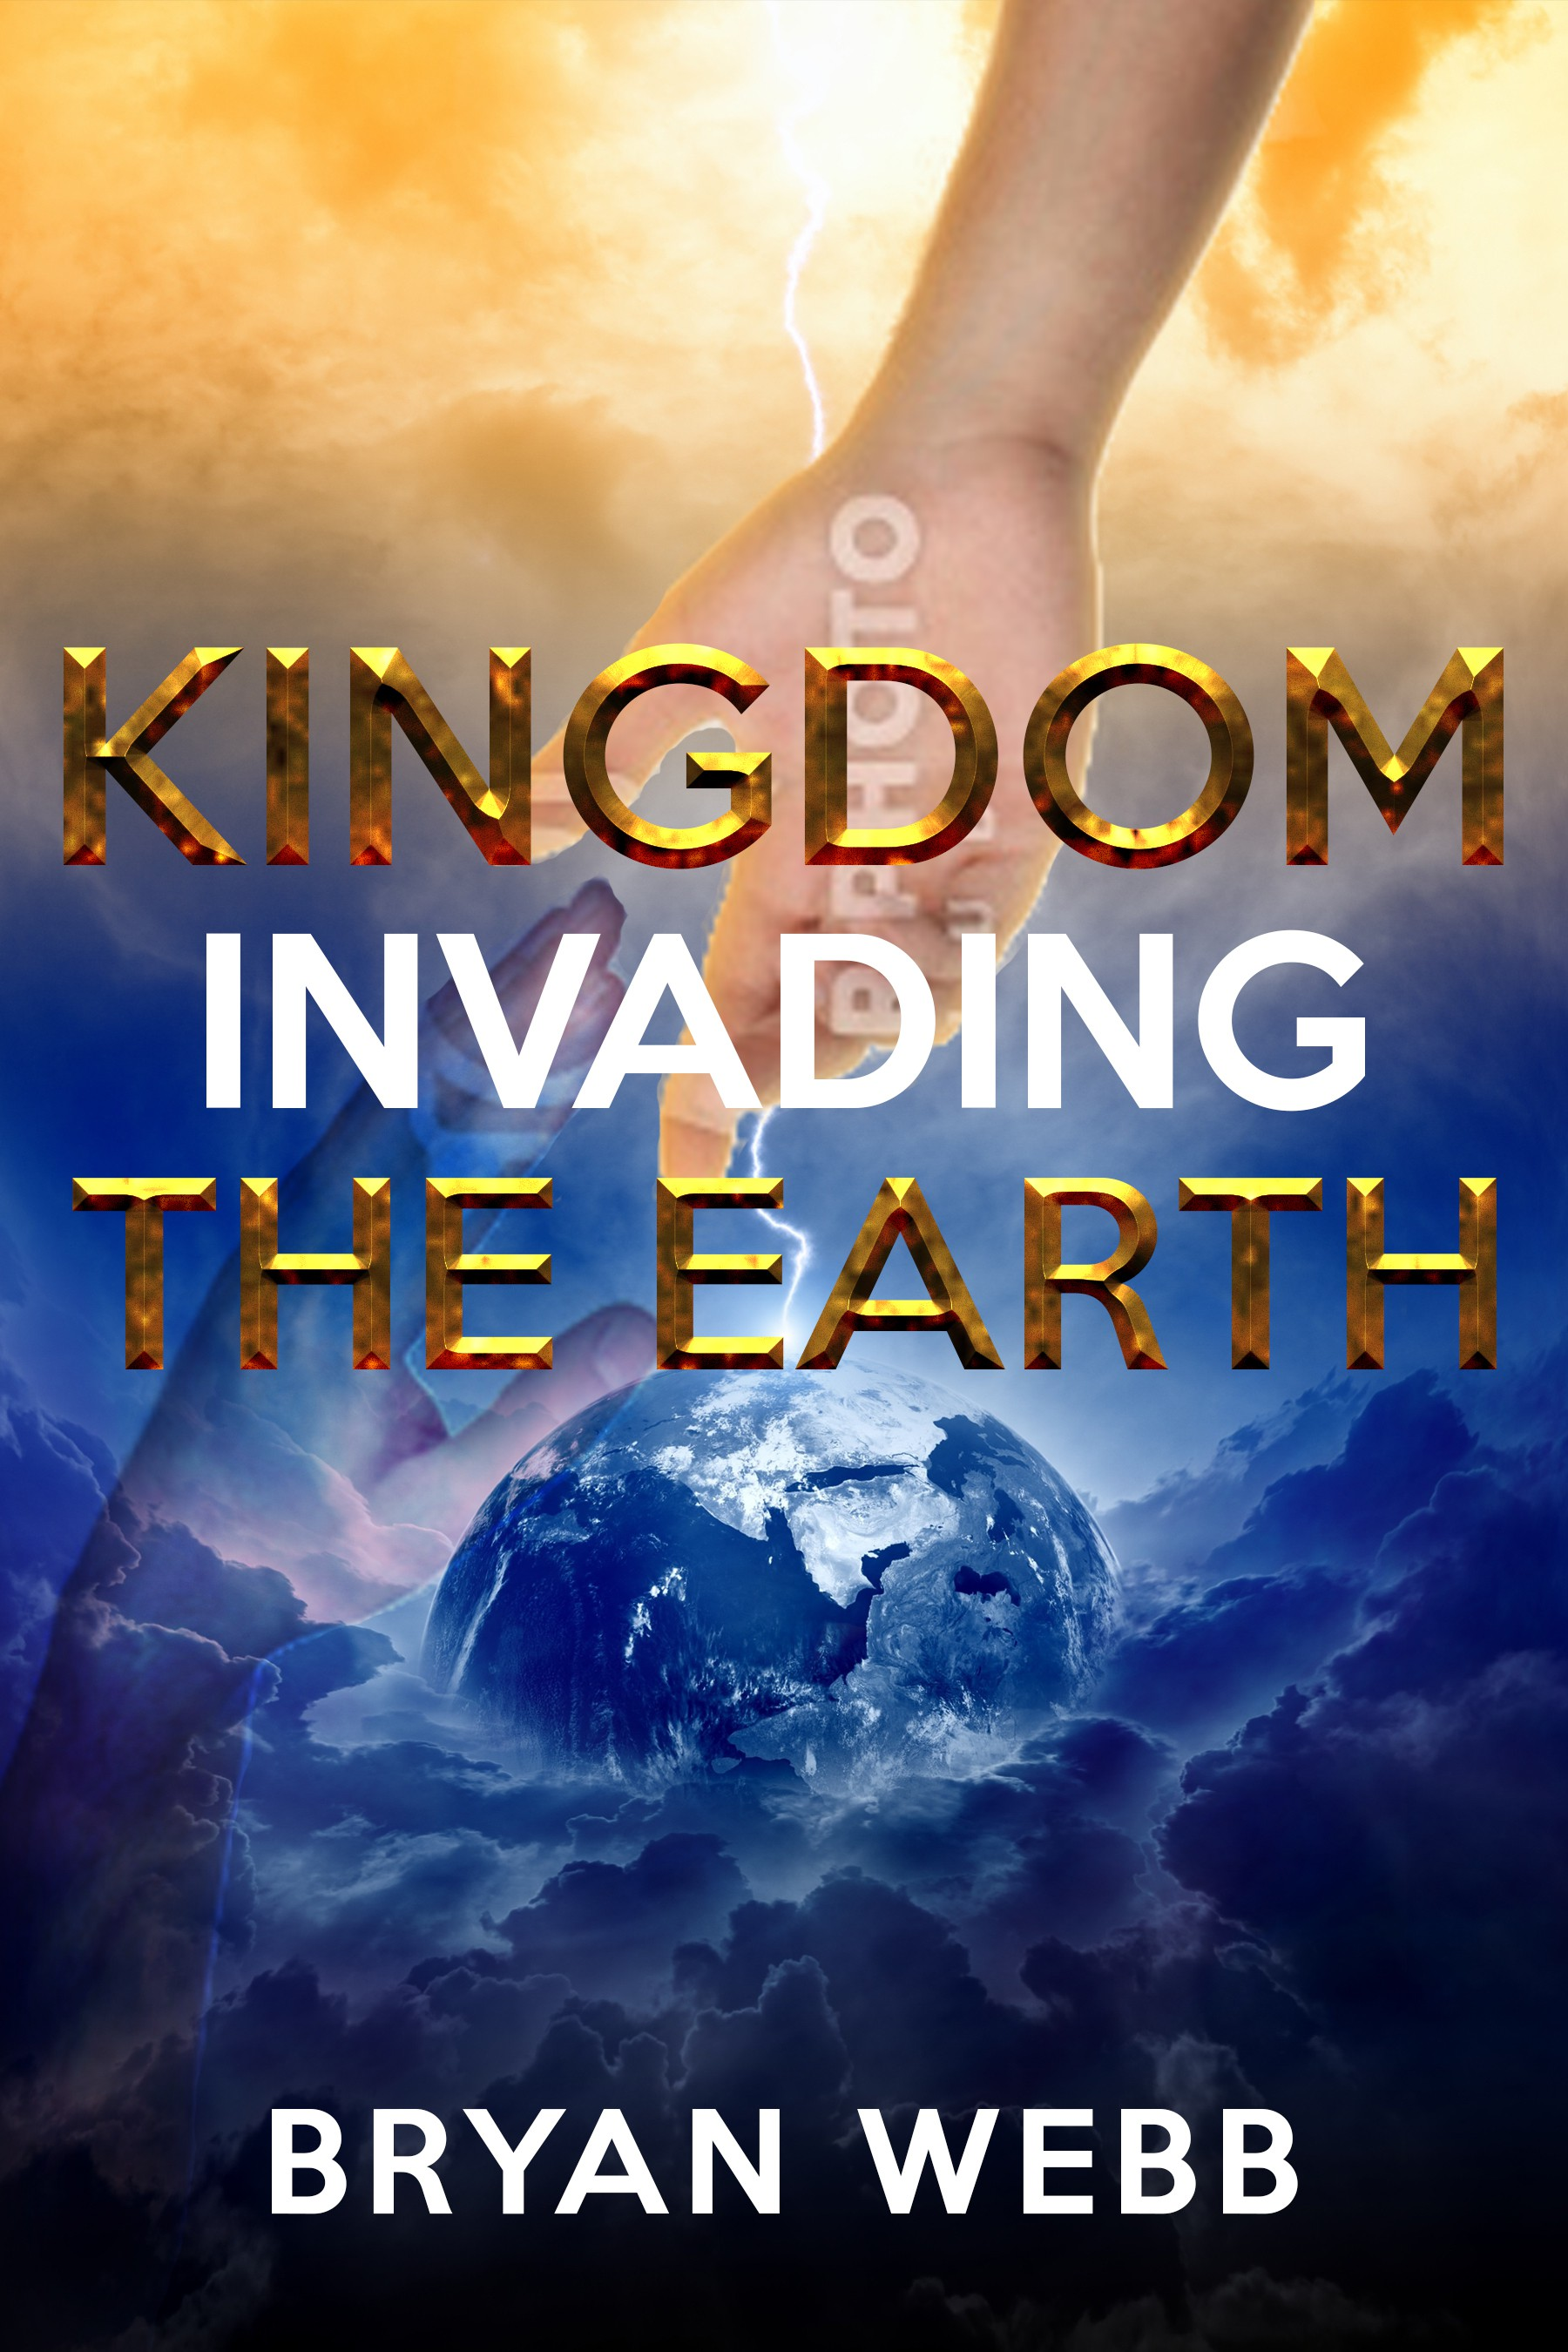 The Kingdom Contest